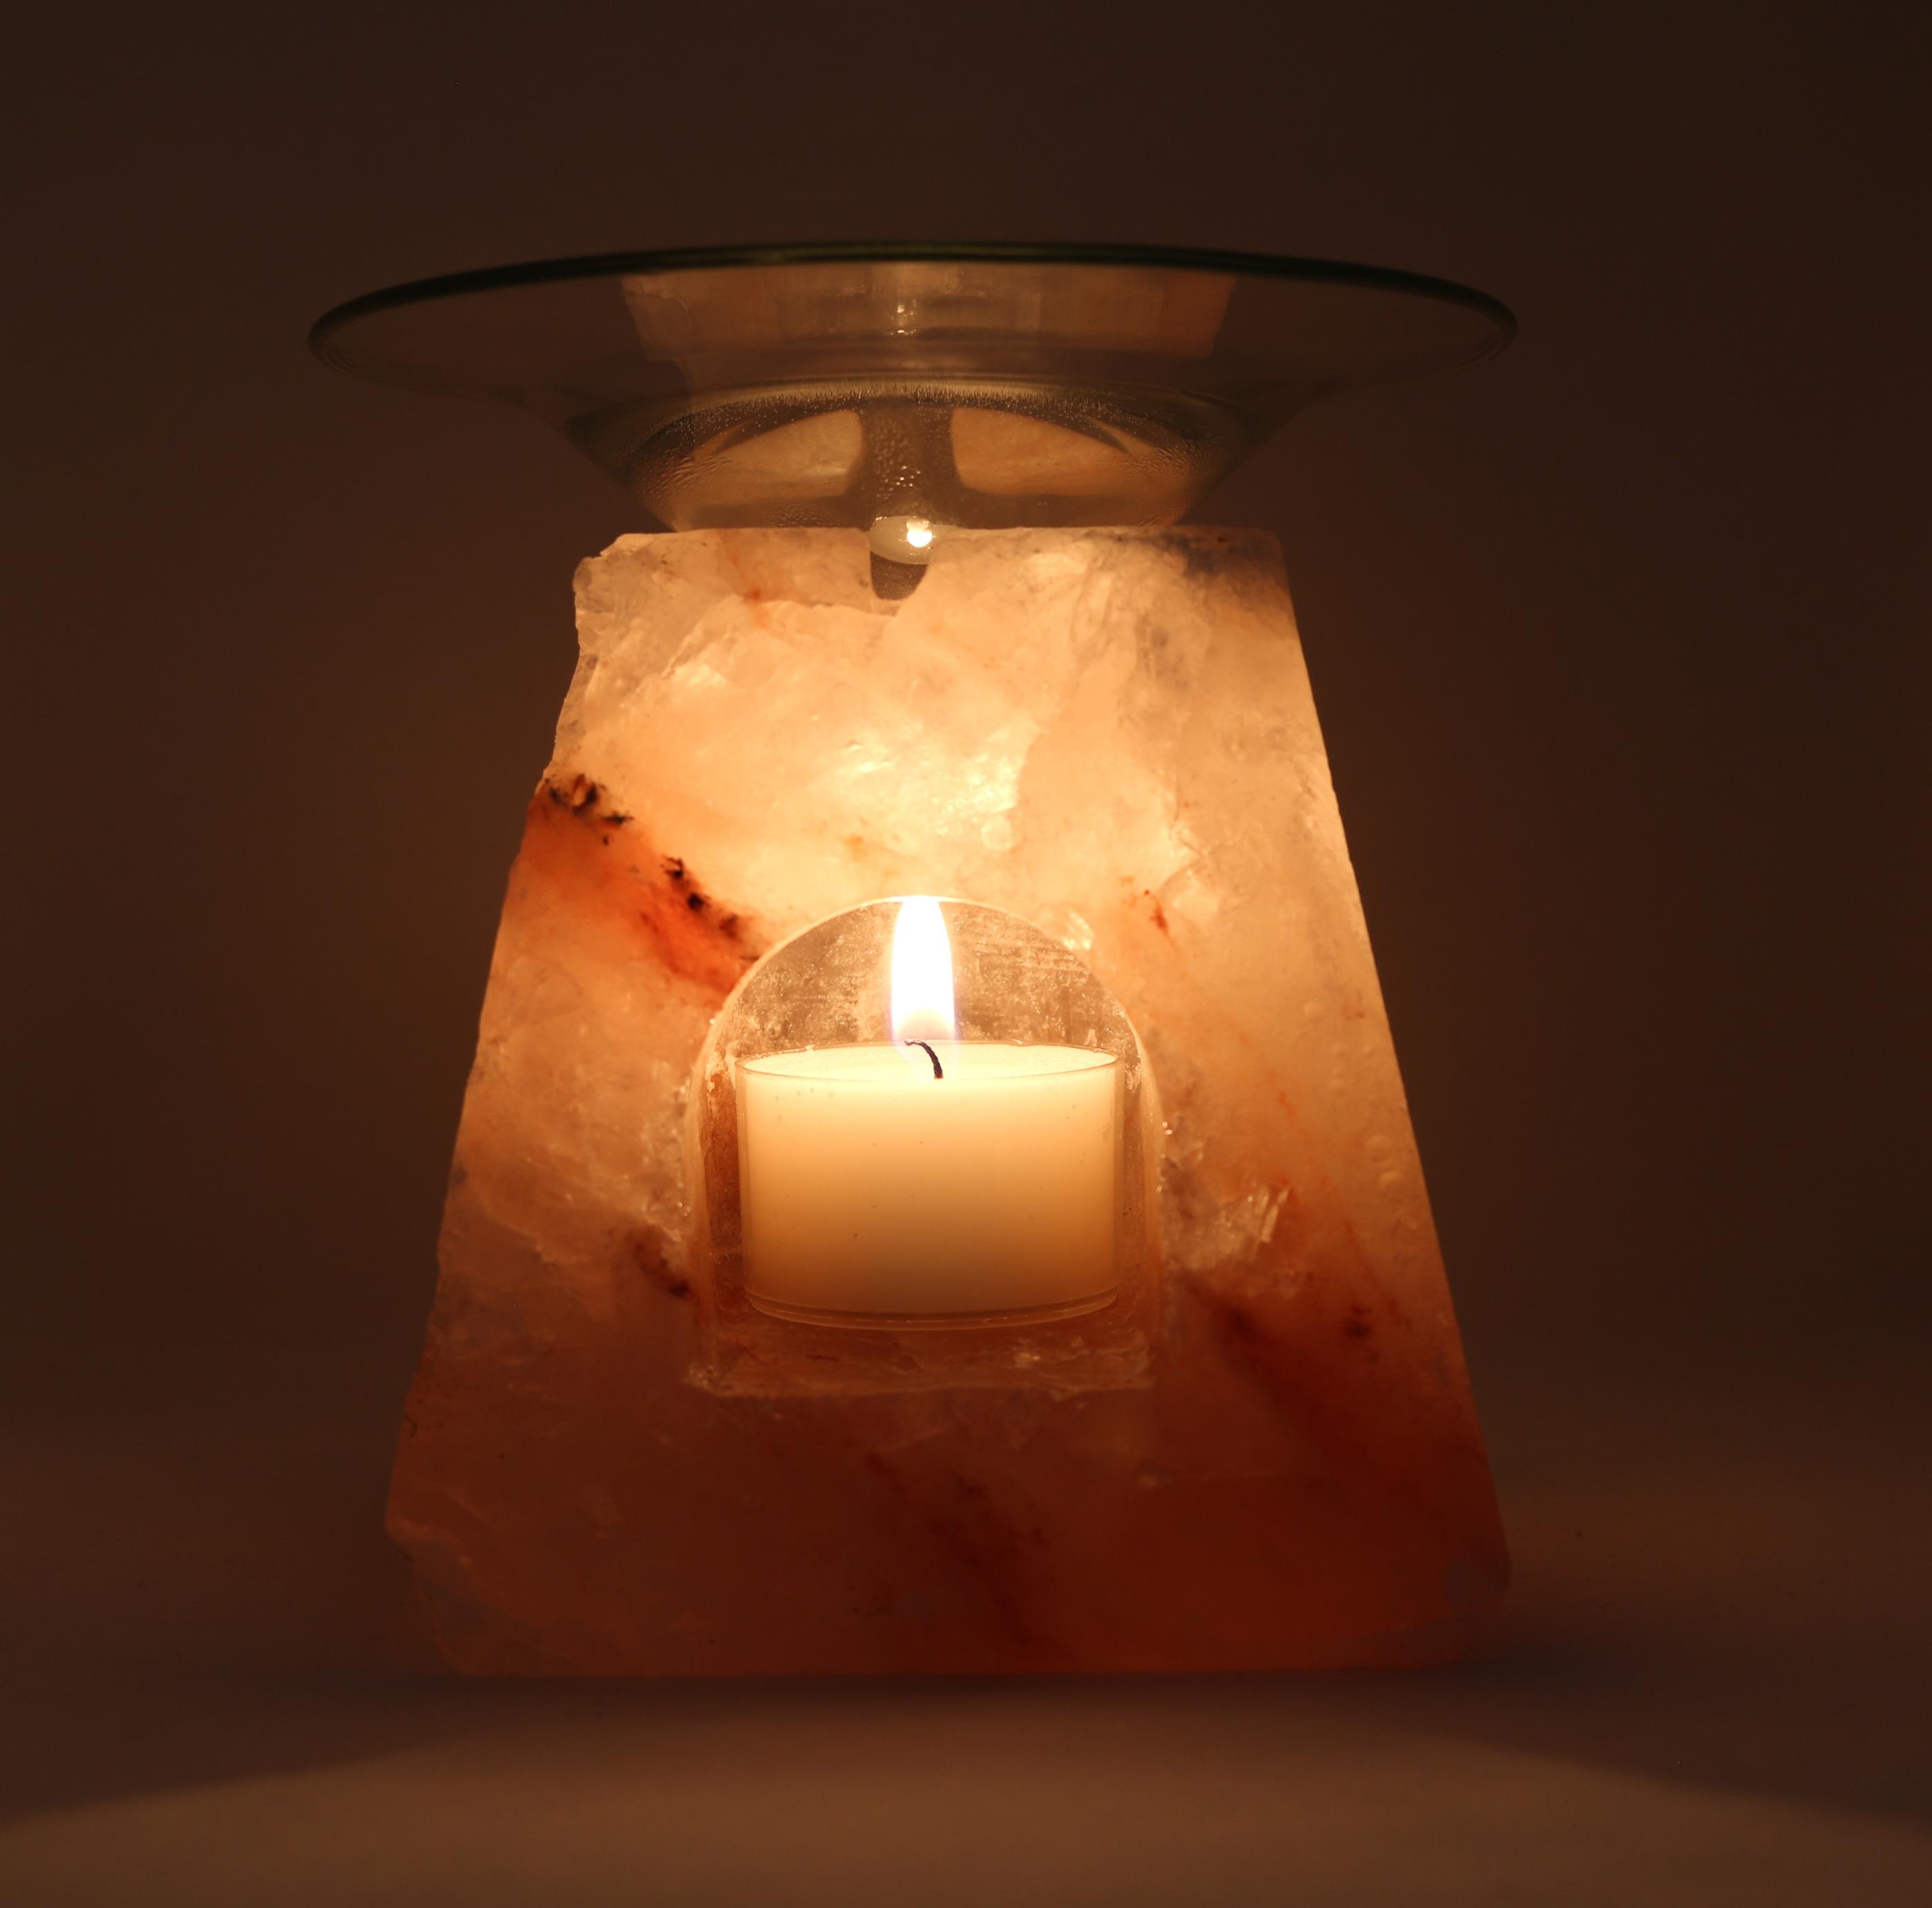 Himalaya Salt Aromabrännare Fyrkantig form wellness ayurveda halmstad sweden svensk värmeljushållare